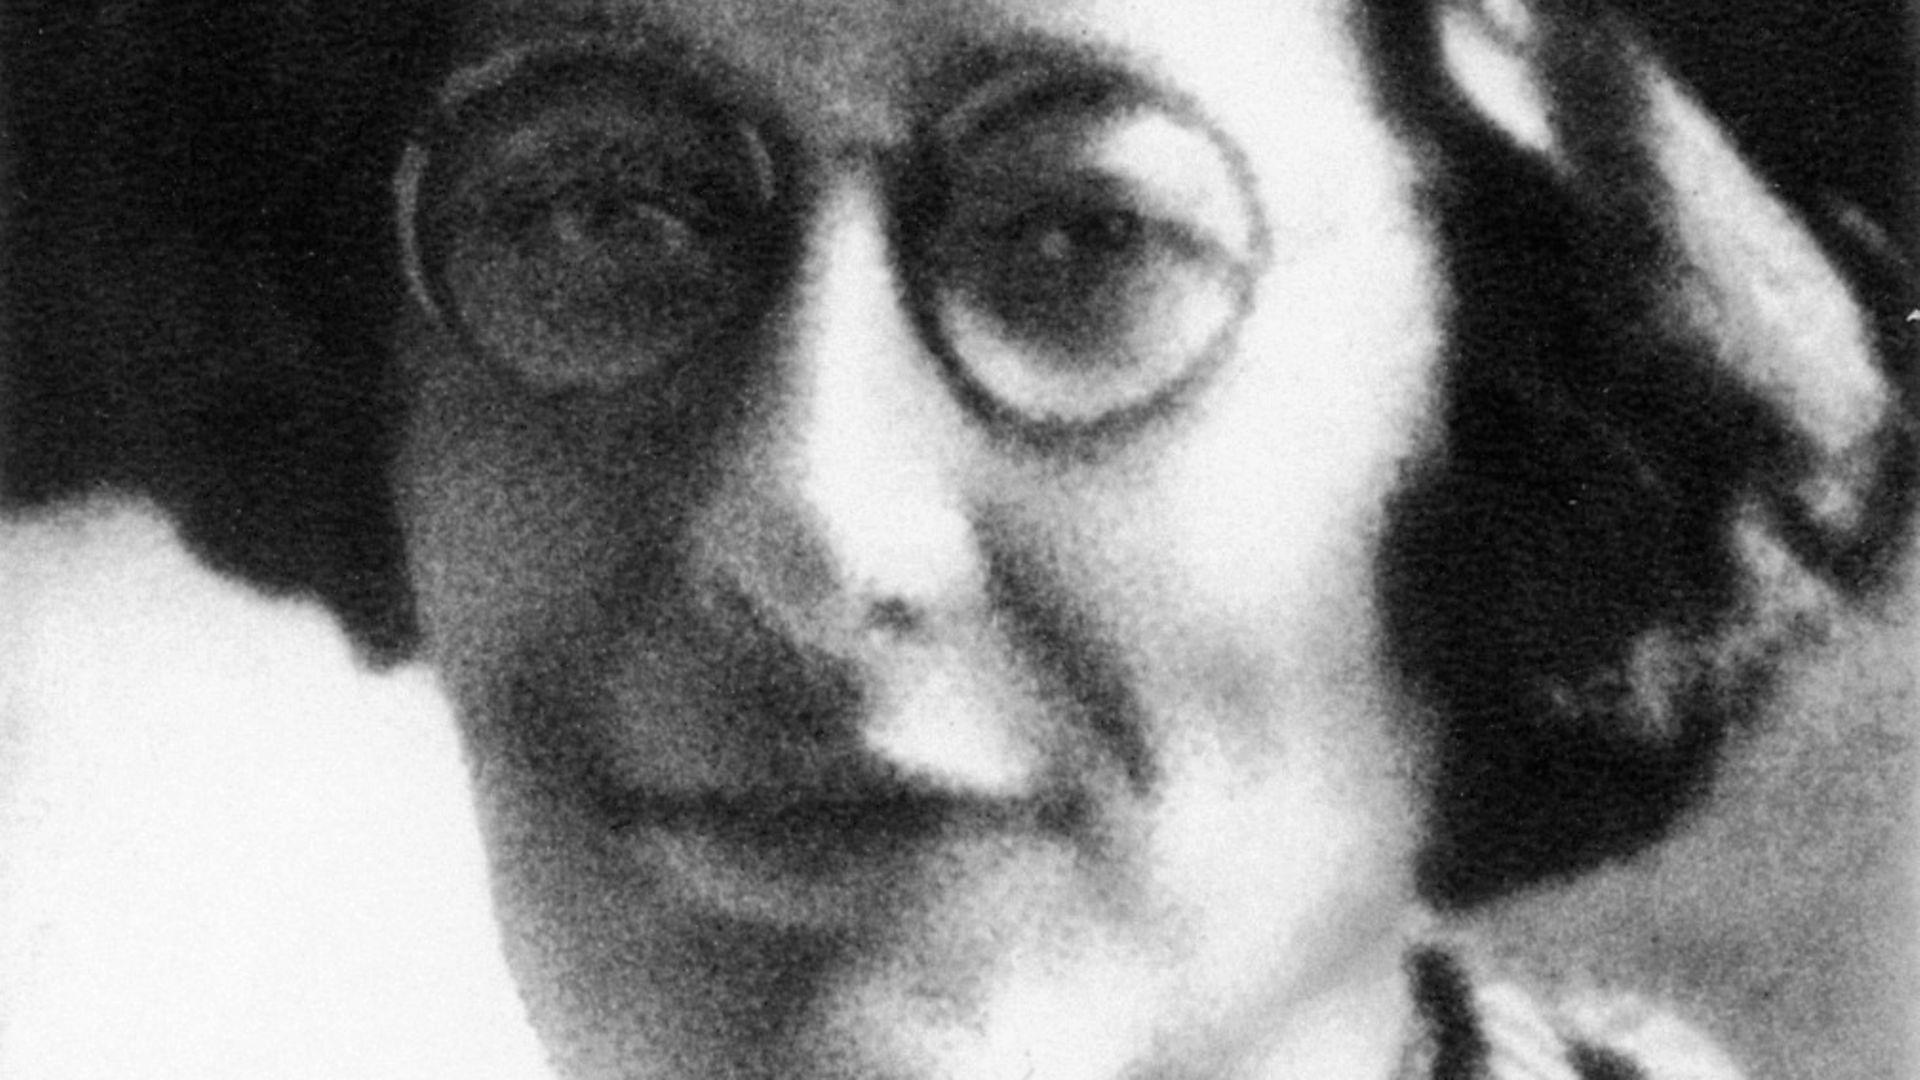 Simone Weil, French philosopher, mystic, and writer. Photo: Granger NYC/TopFoto. - Credit: Granger, NYC / TopFoto